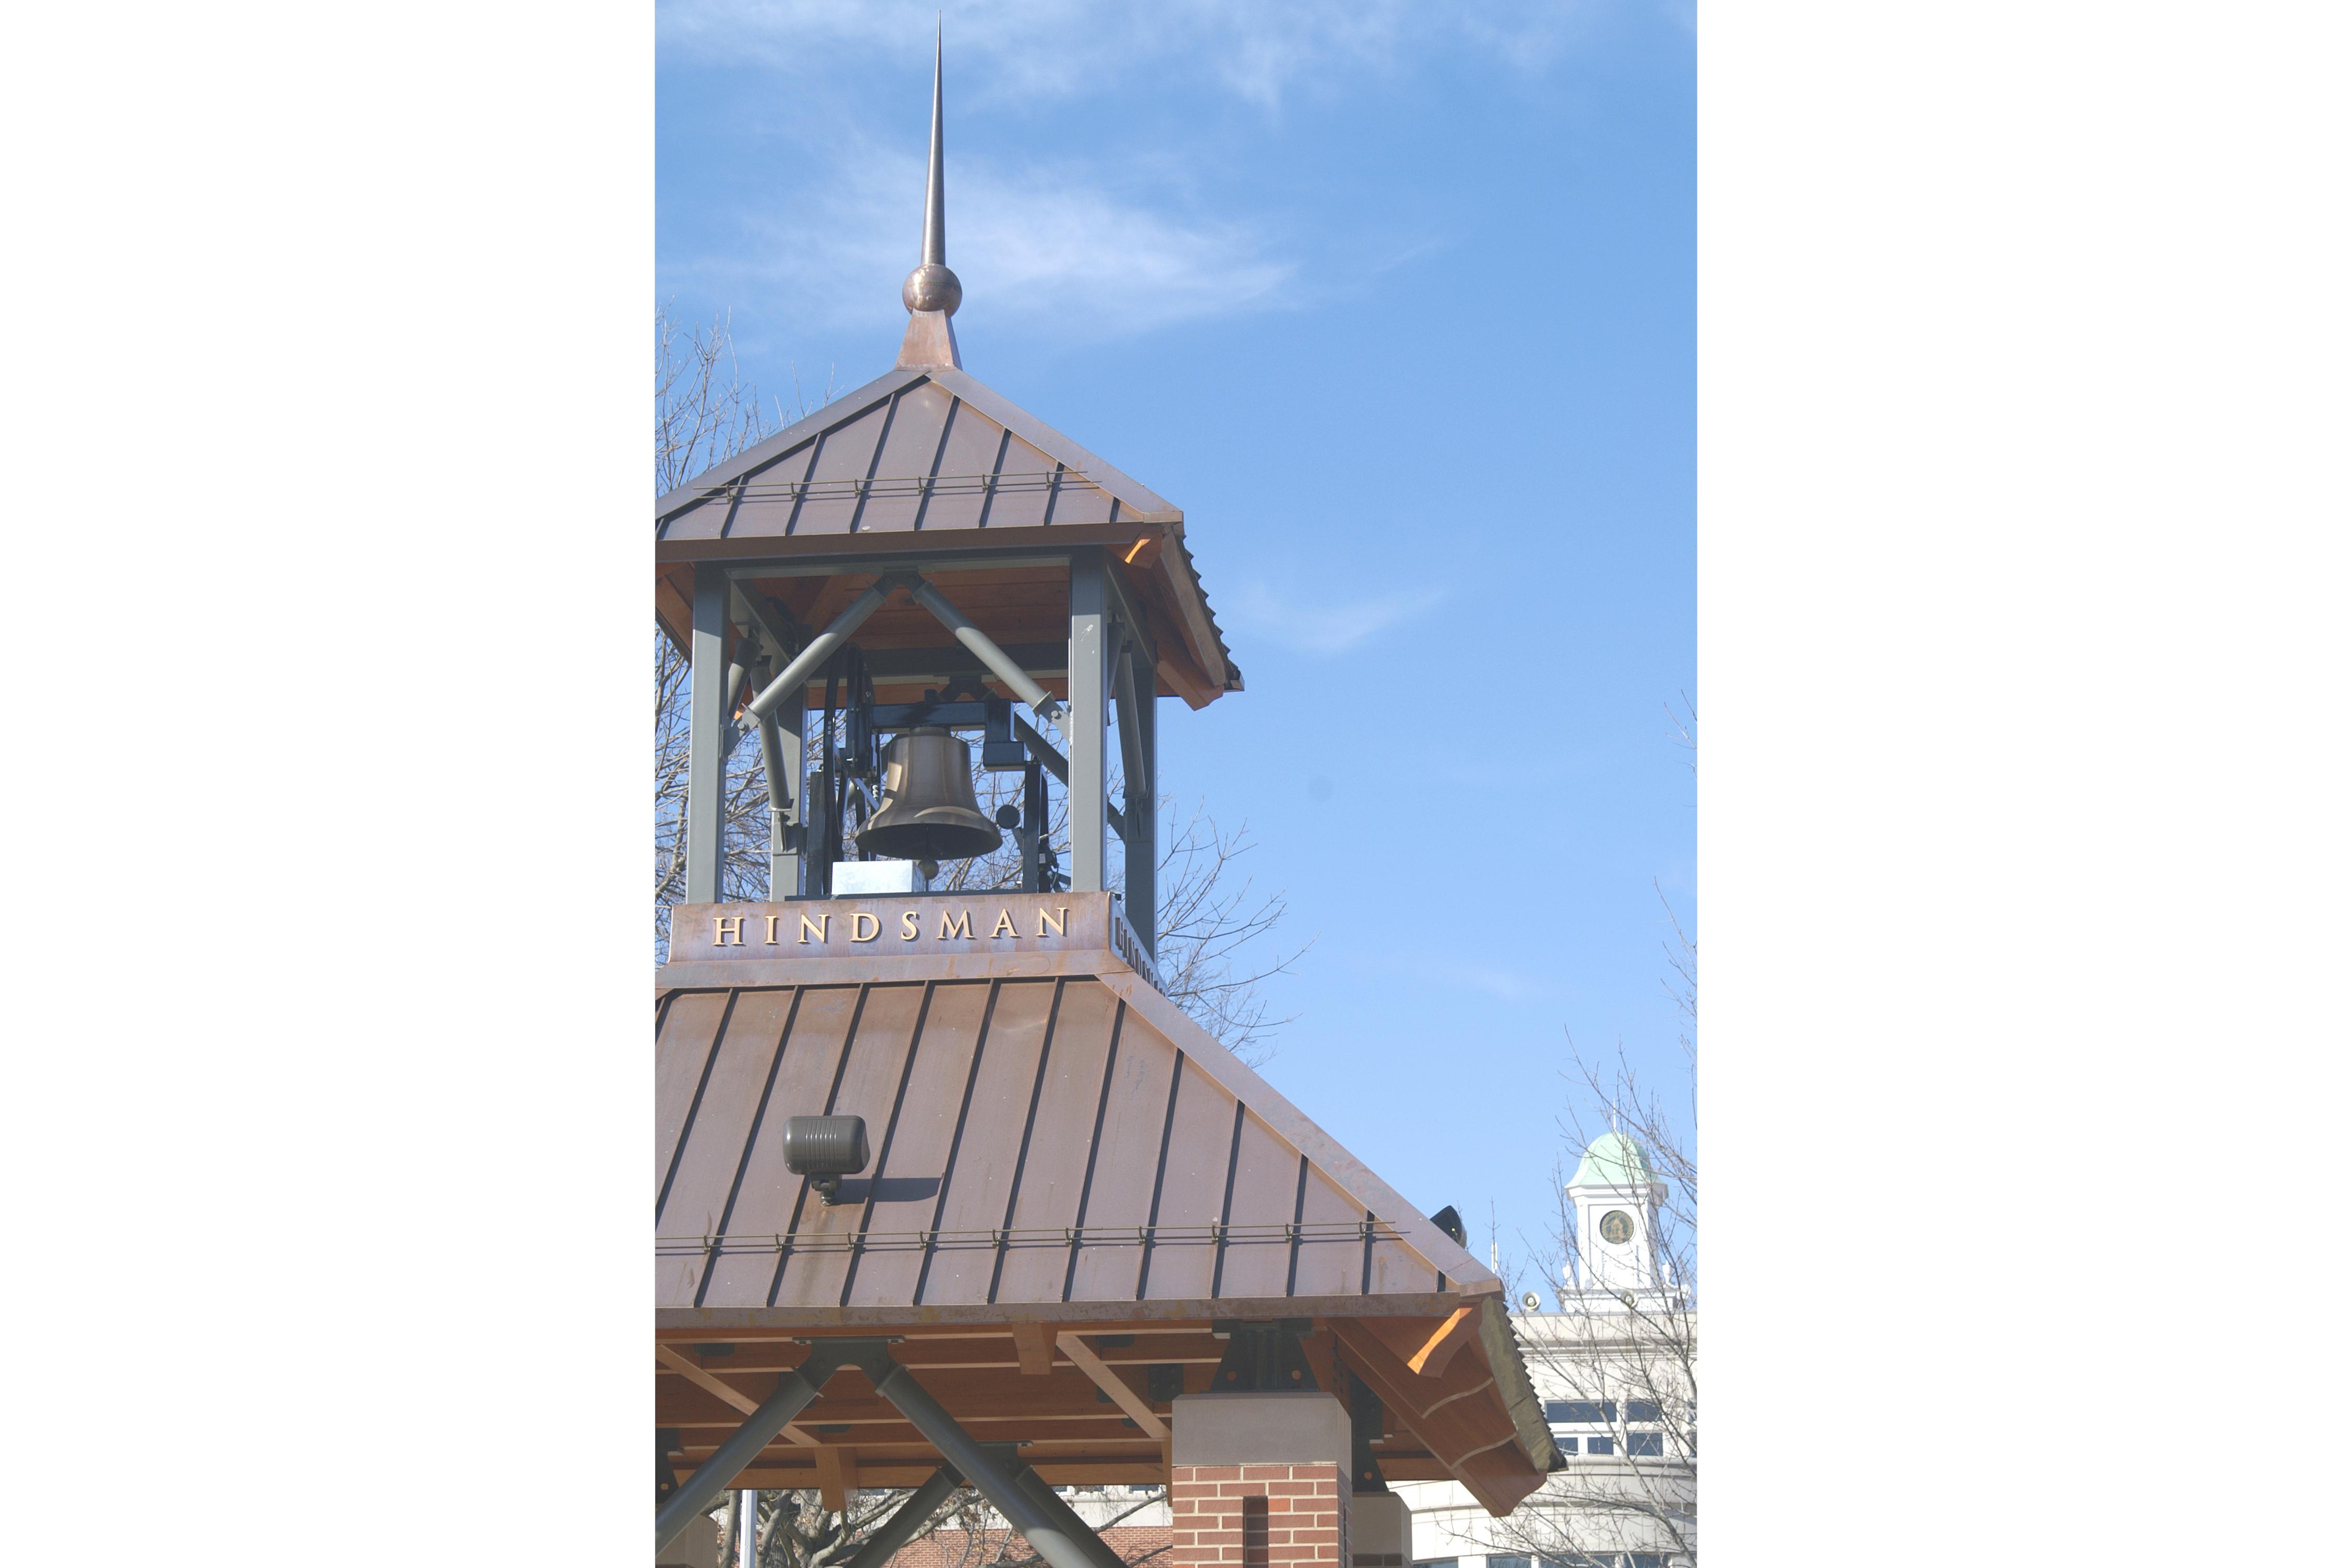 Hindsman Bell Tower